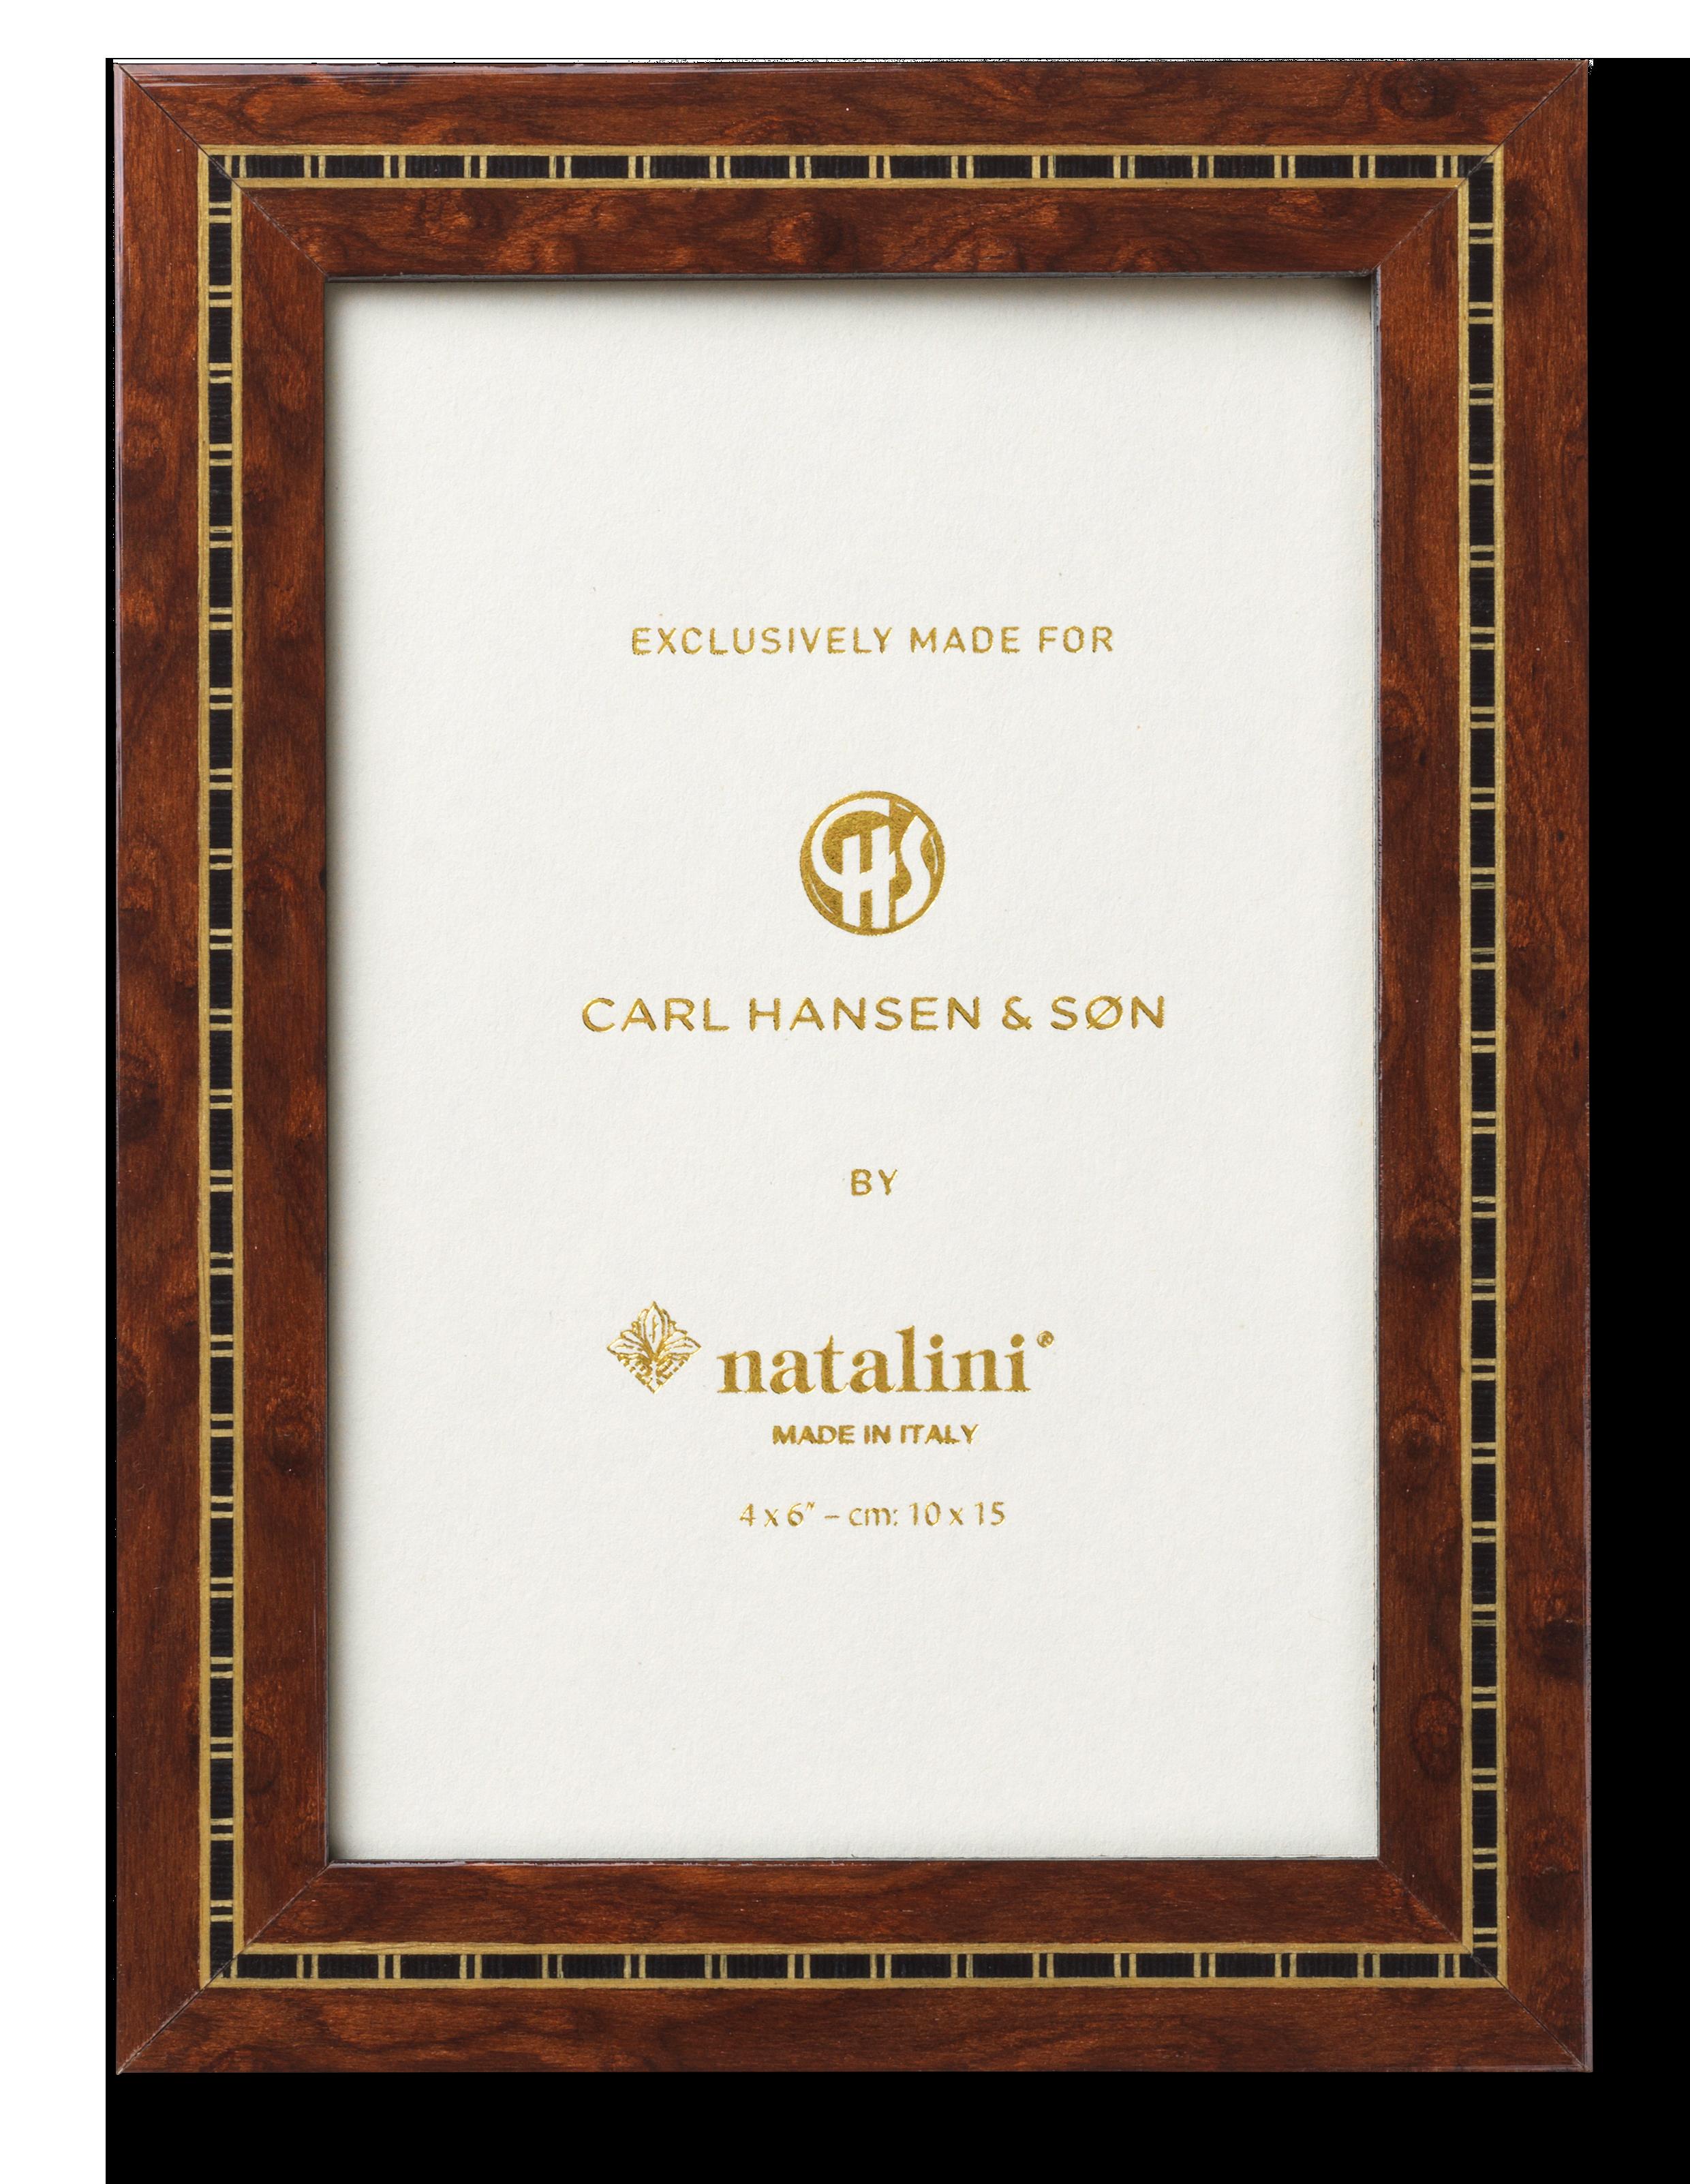 Natalini frame